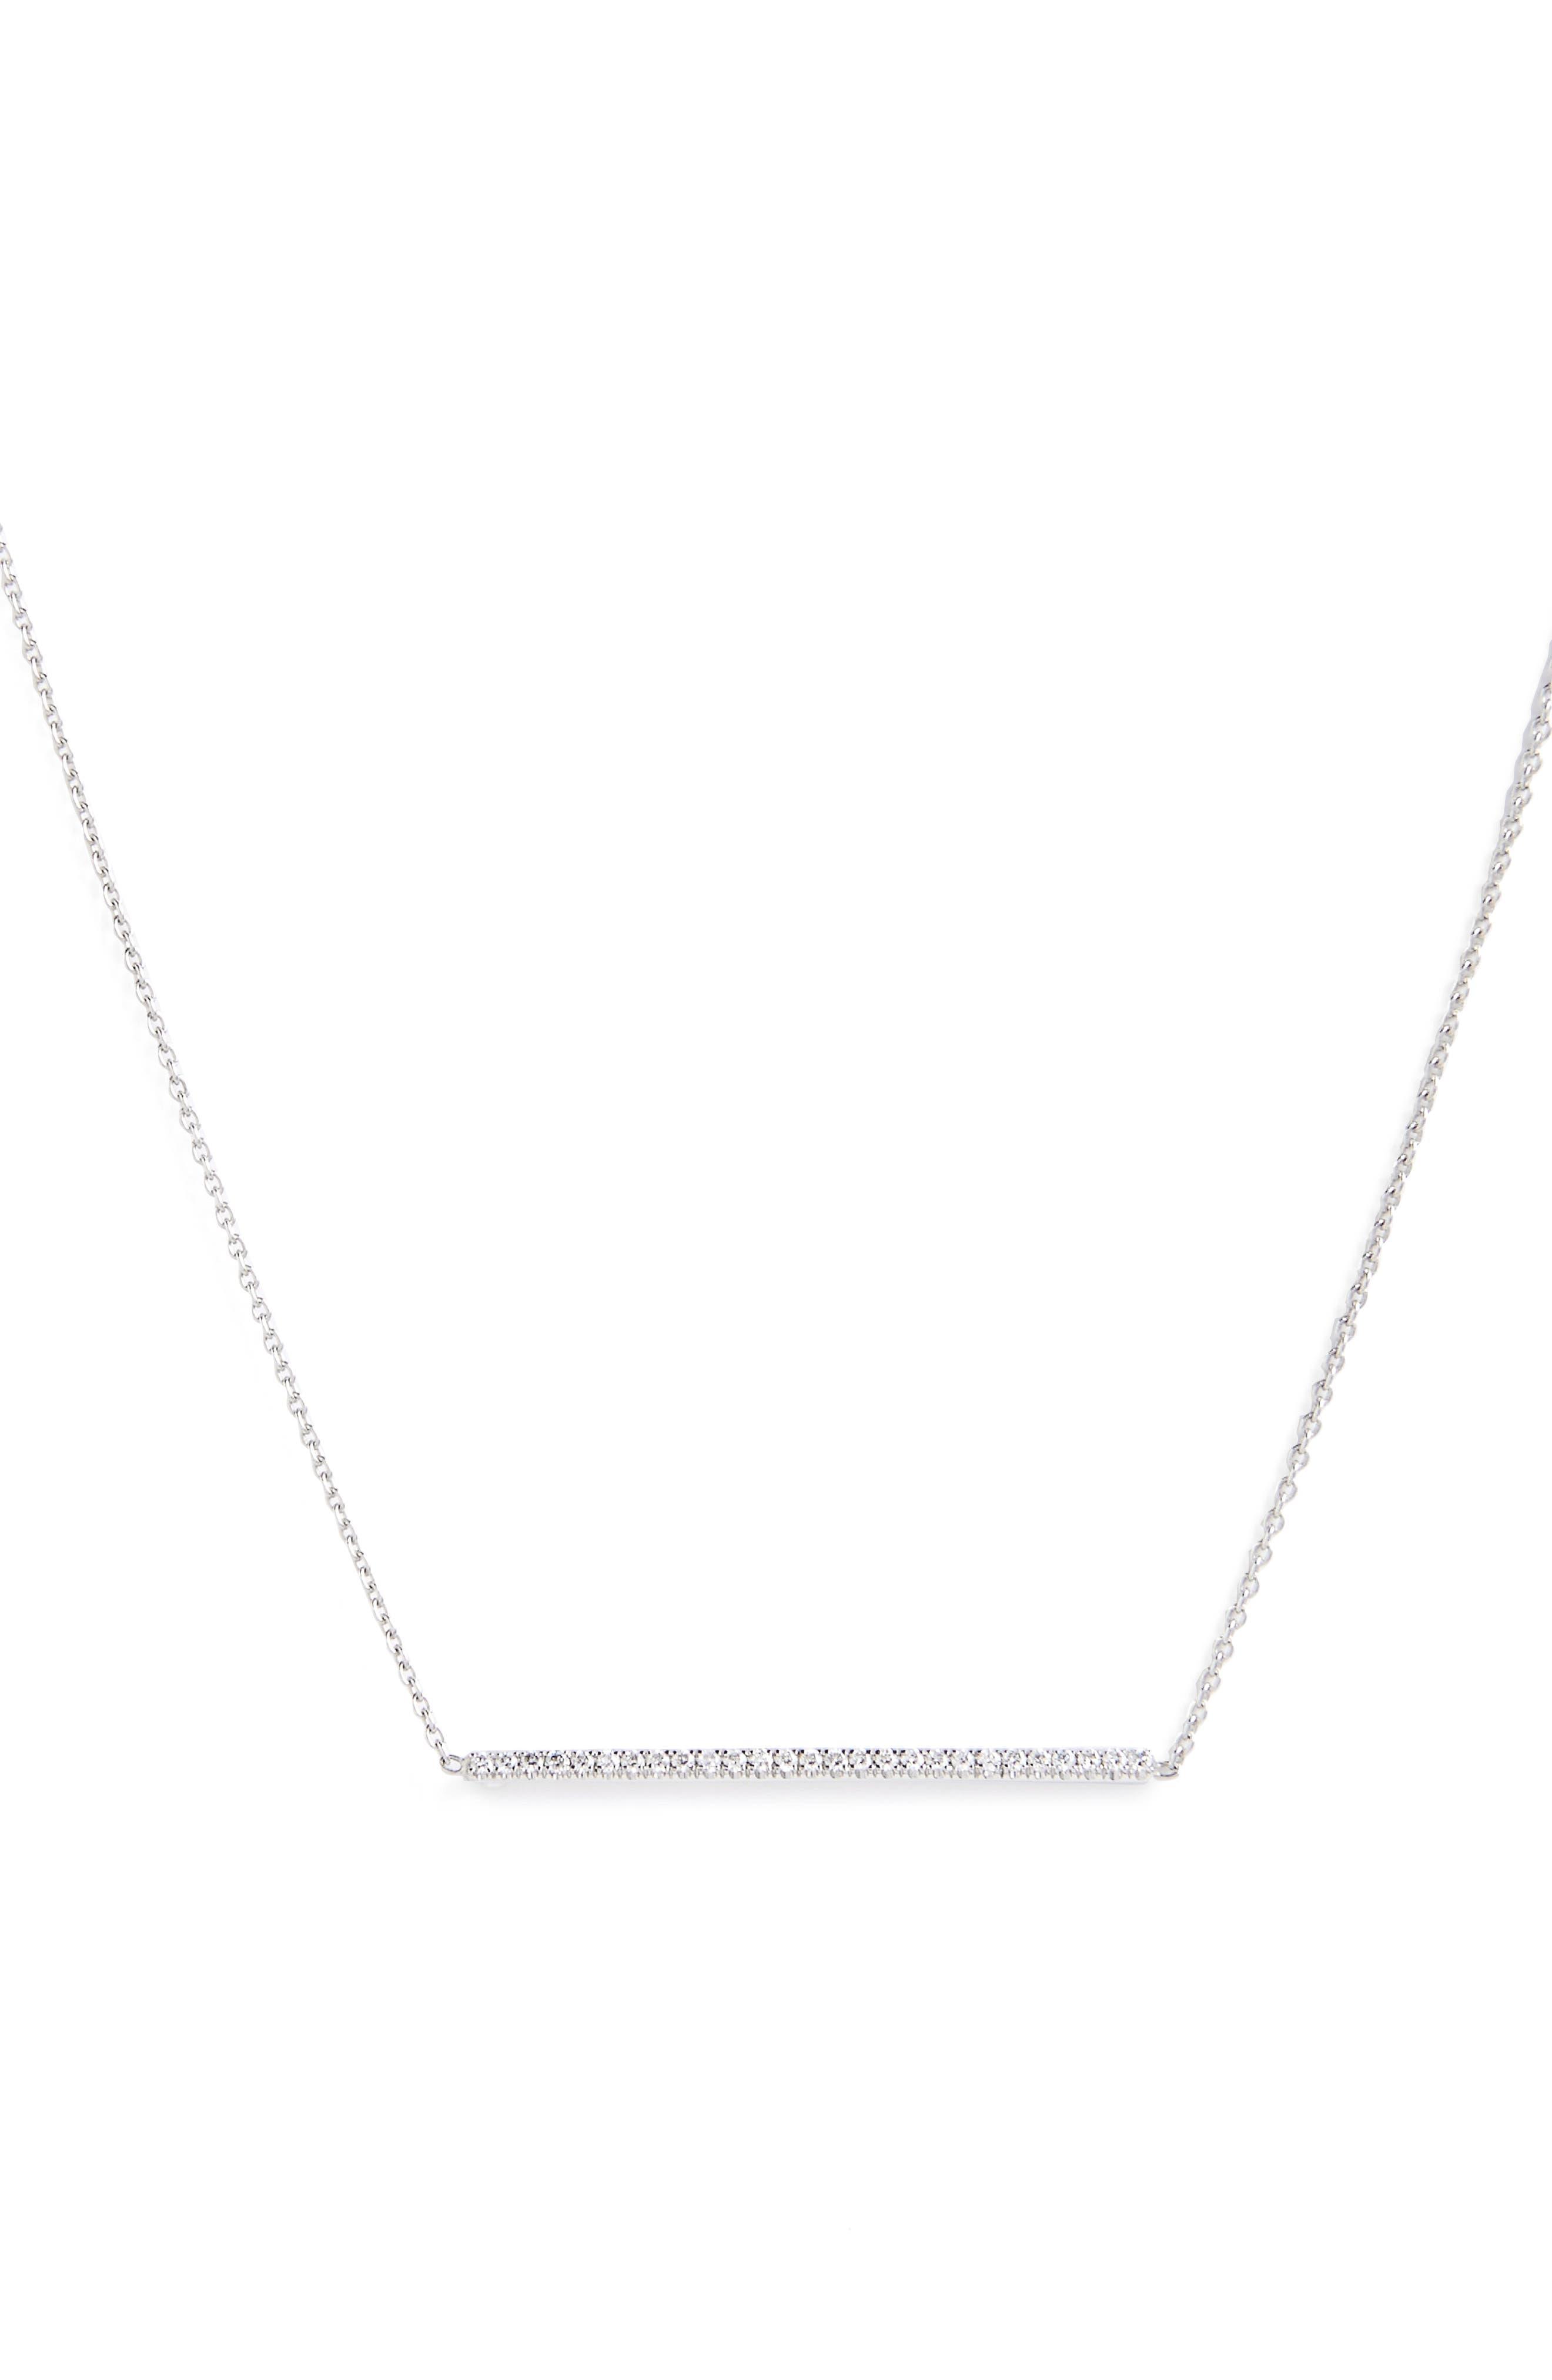 Tiny Treasures Diamond Bar Necklace,                         Main,                         color, WHITE GOLD